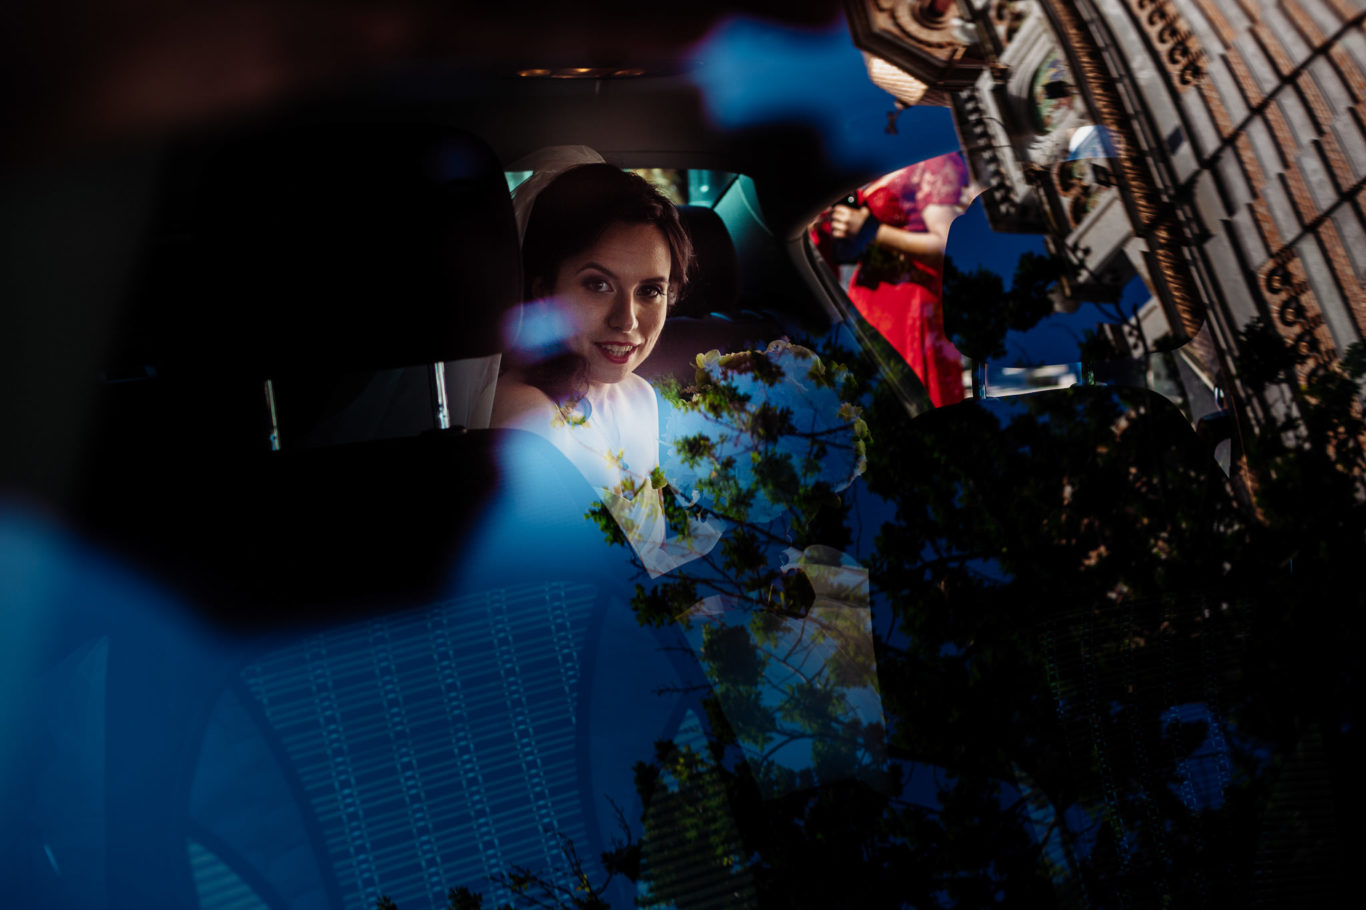 0375-Fotografie-nunta-Simona-Valentin-fotograf-Ciprian-Dumitrescu-CDF_9034